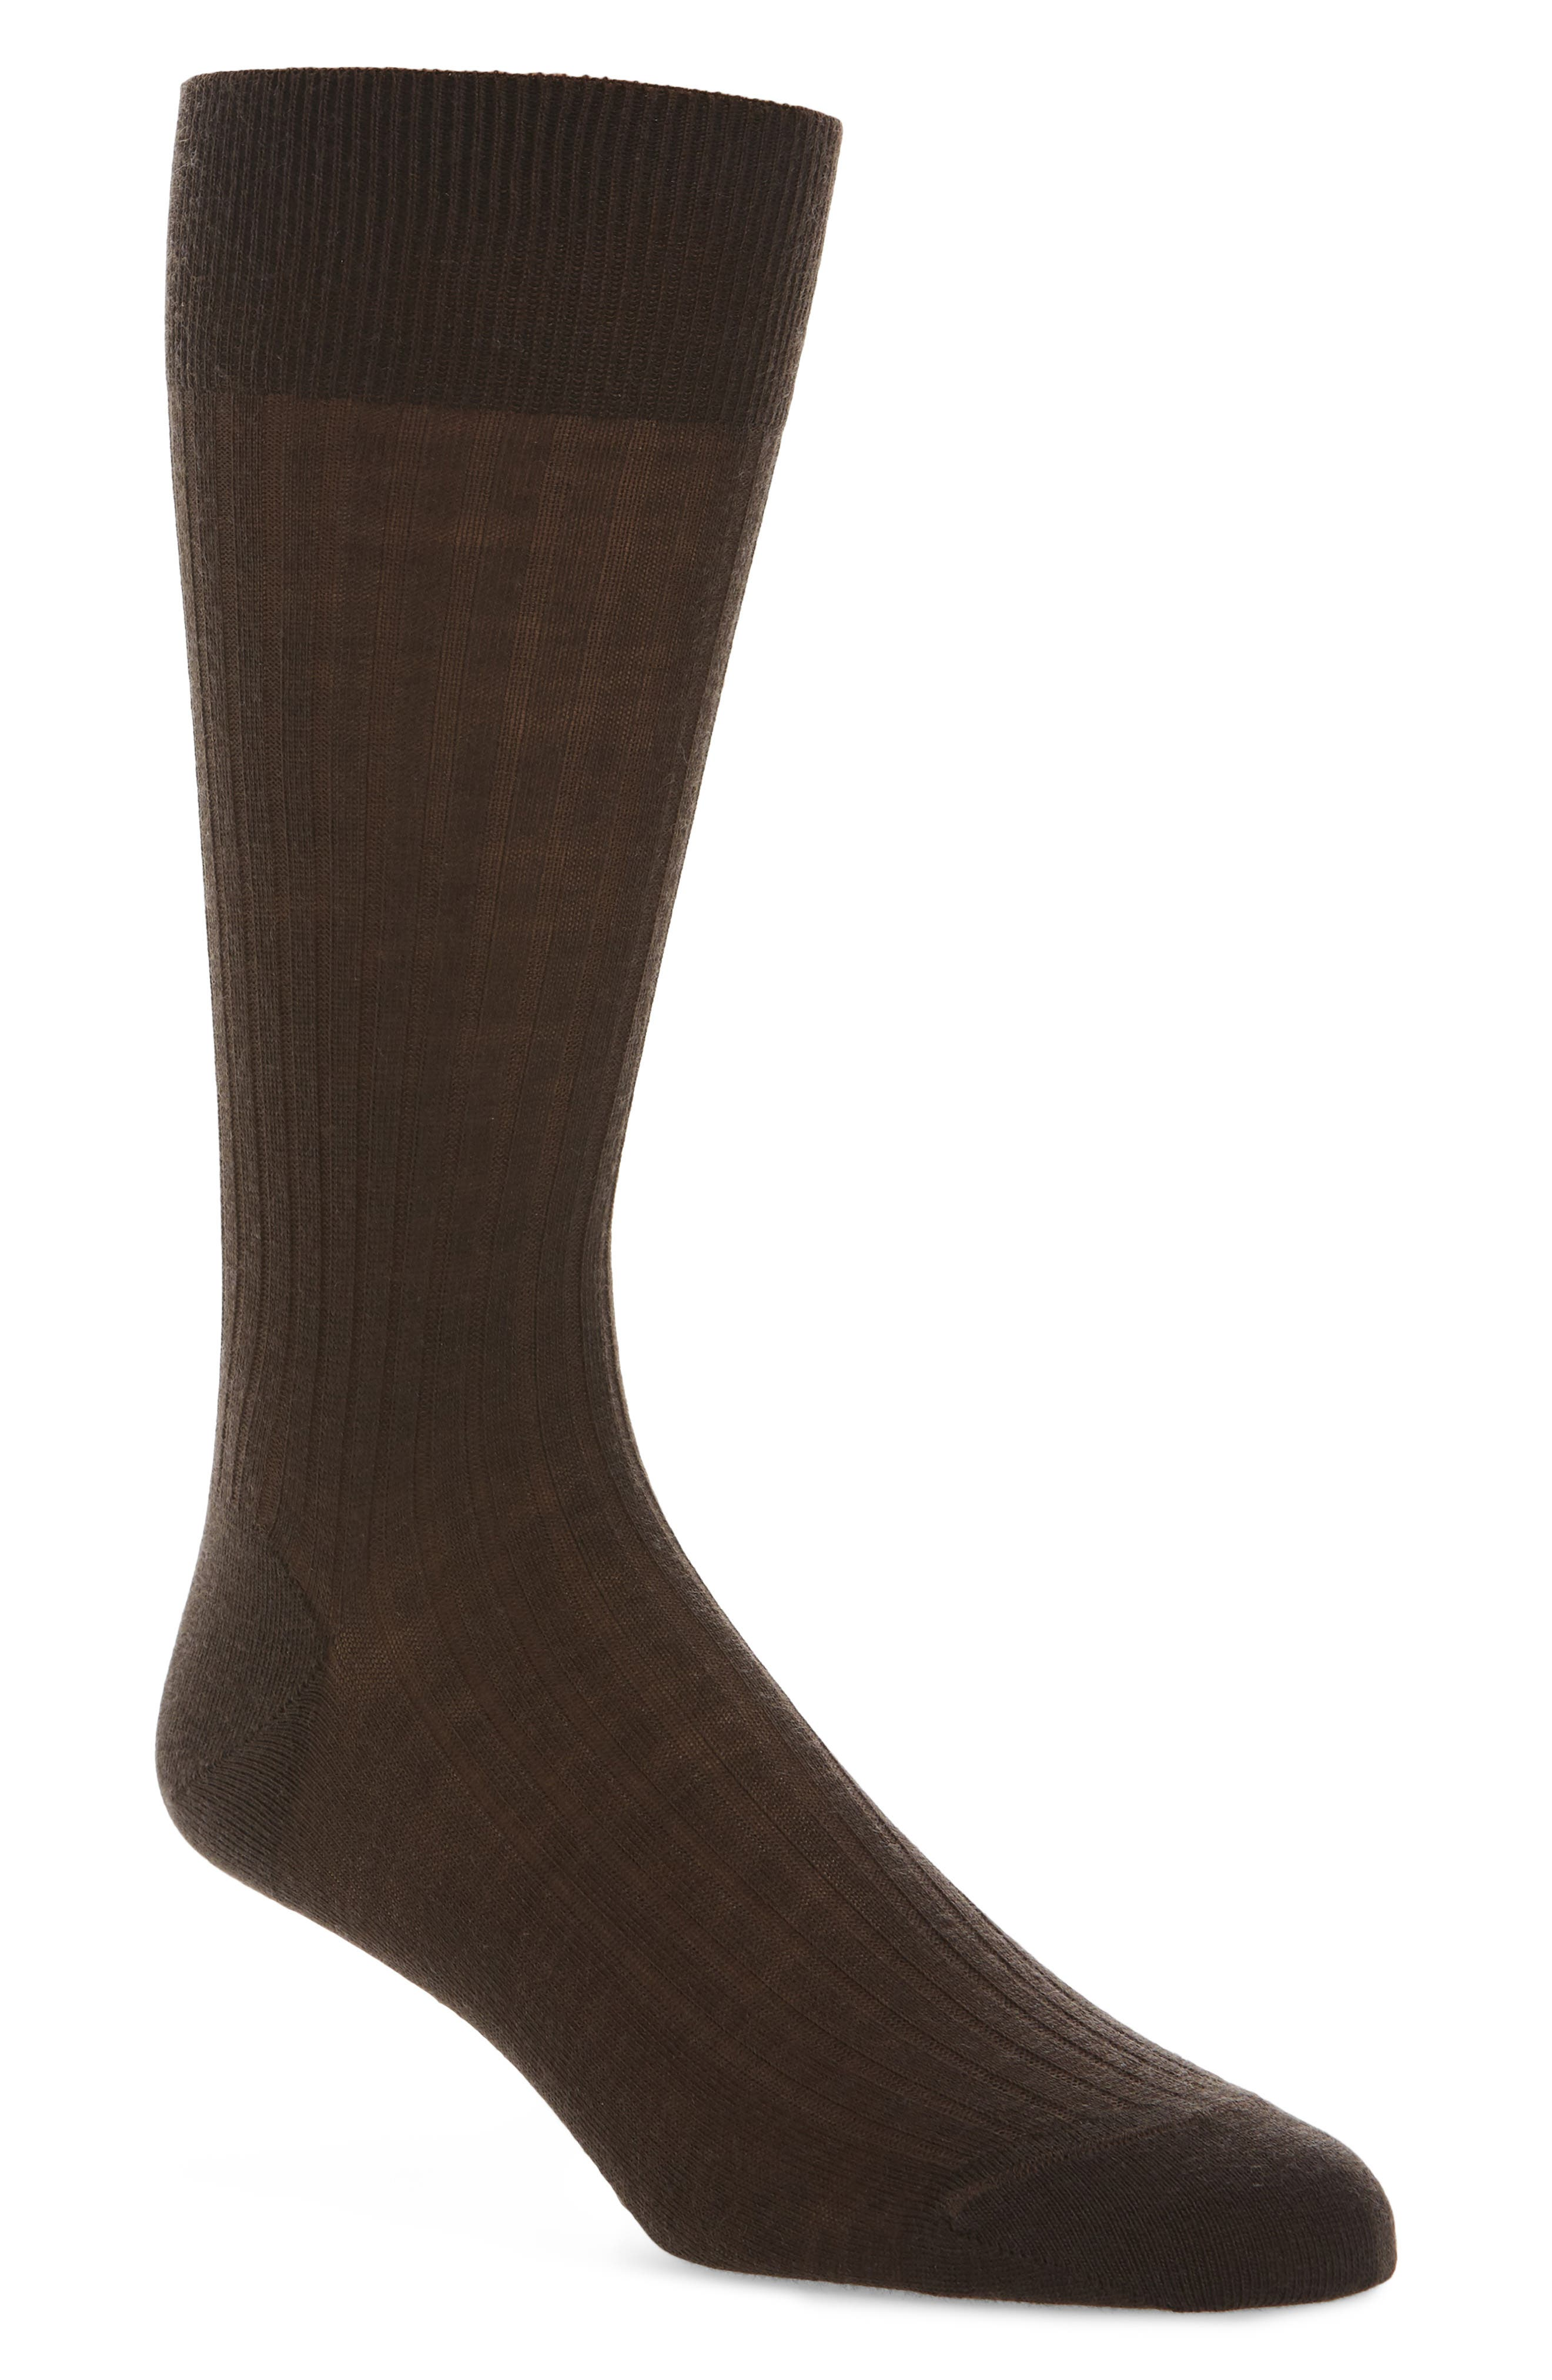 John W. Nordstrom® Ribbed Merino Wool Socks